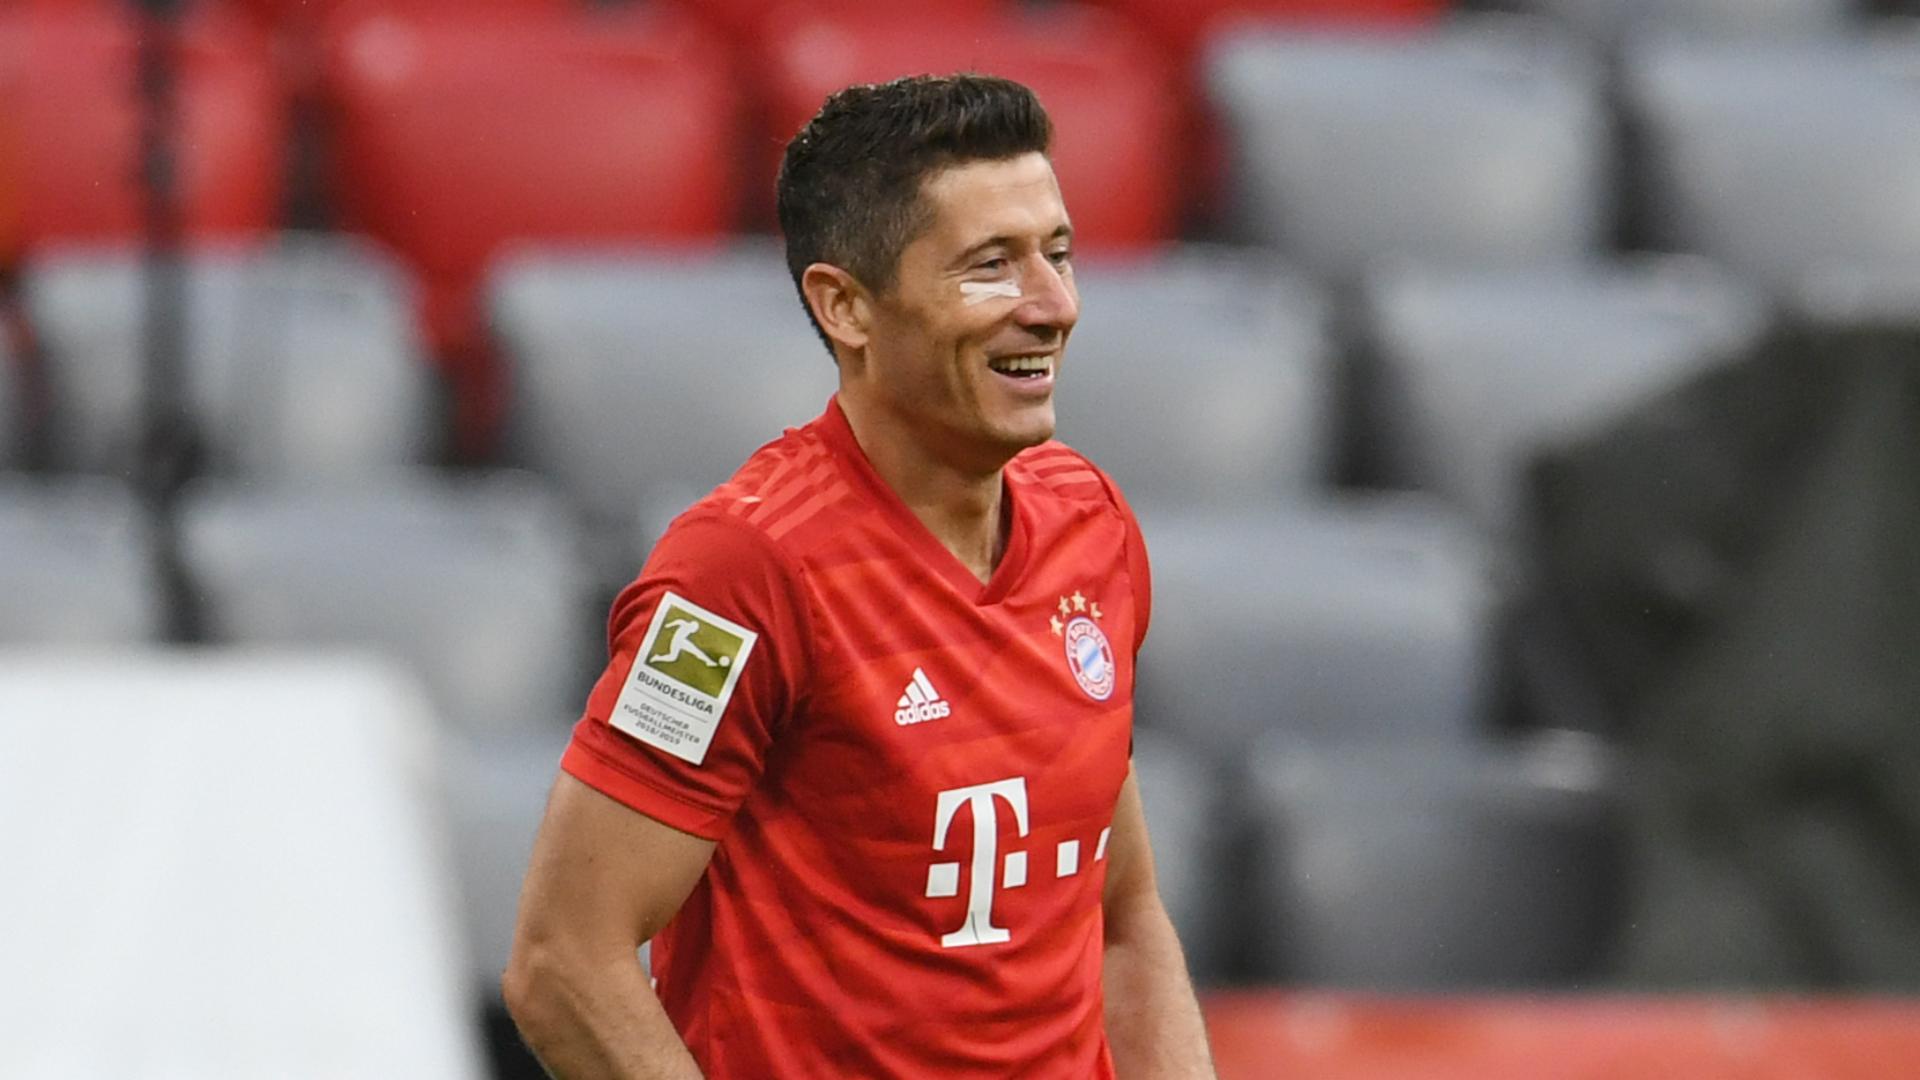 Can Lewandowski end his Dusseldorf drought? - The Bundesliga in Opta Facts